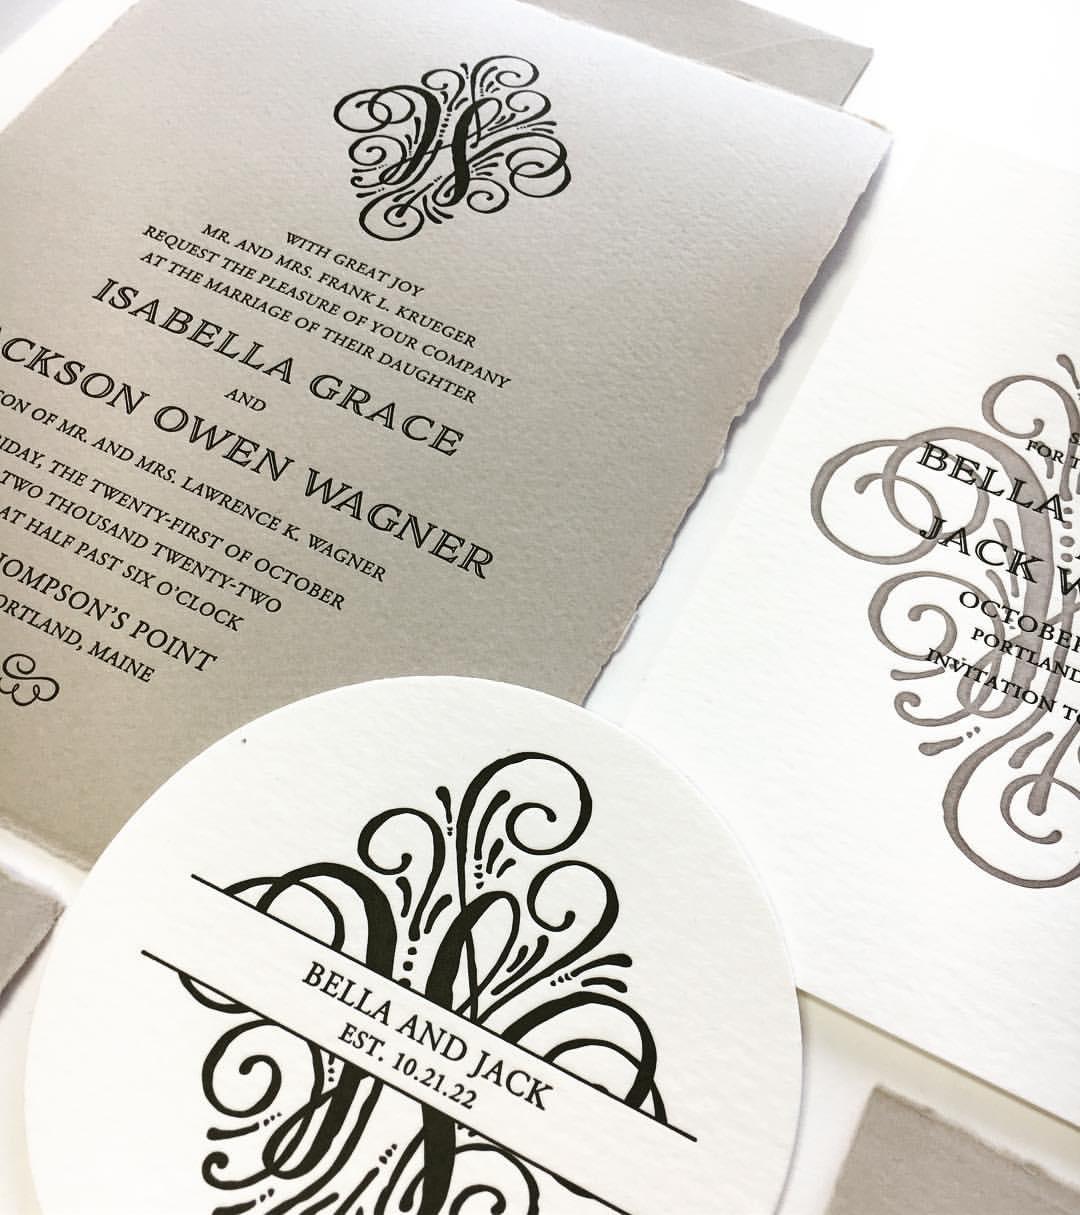 Stunningly ornate monogram is the focus of this beautiful textured invitation suite.